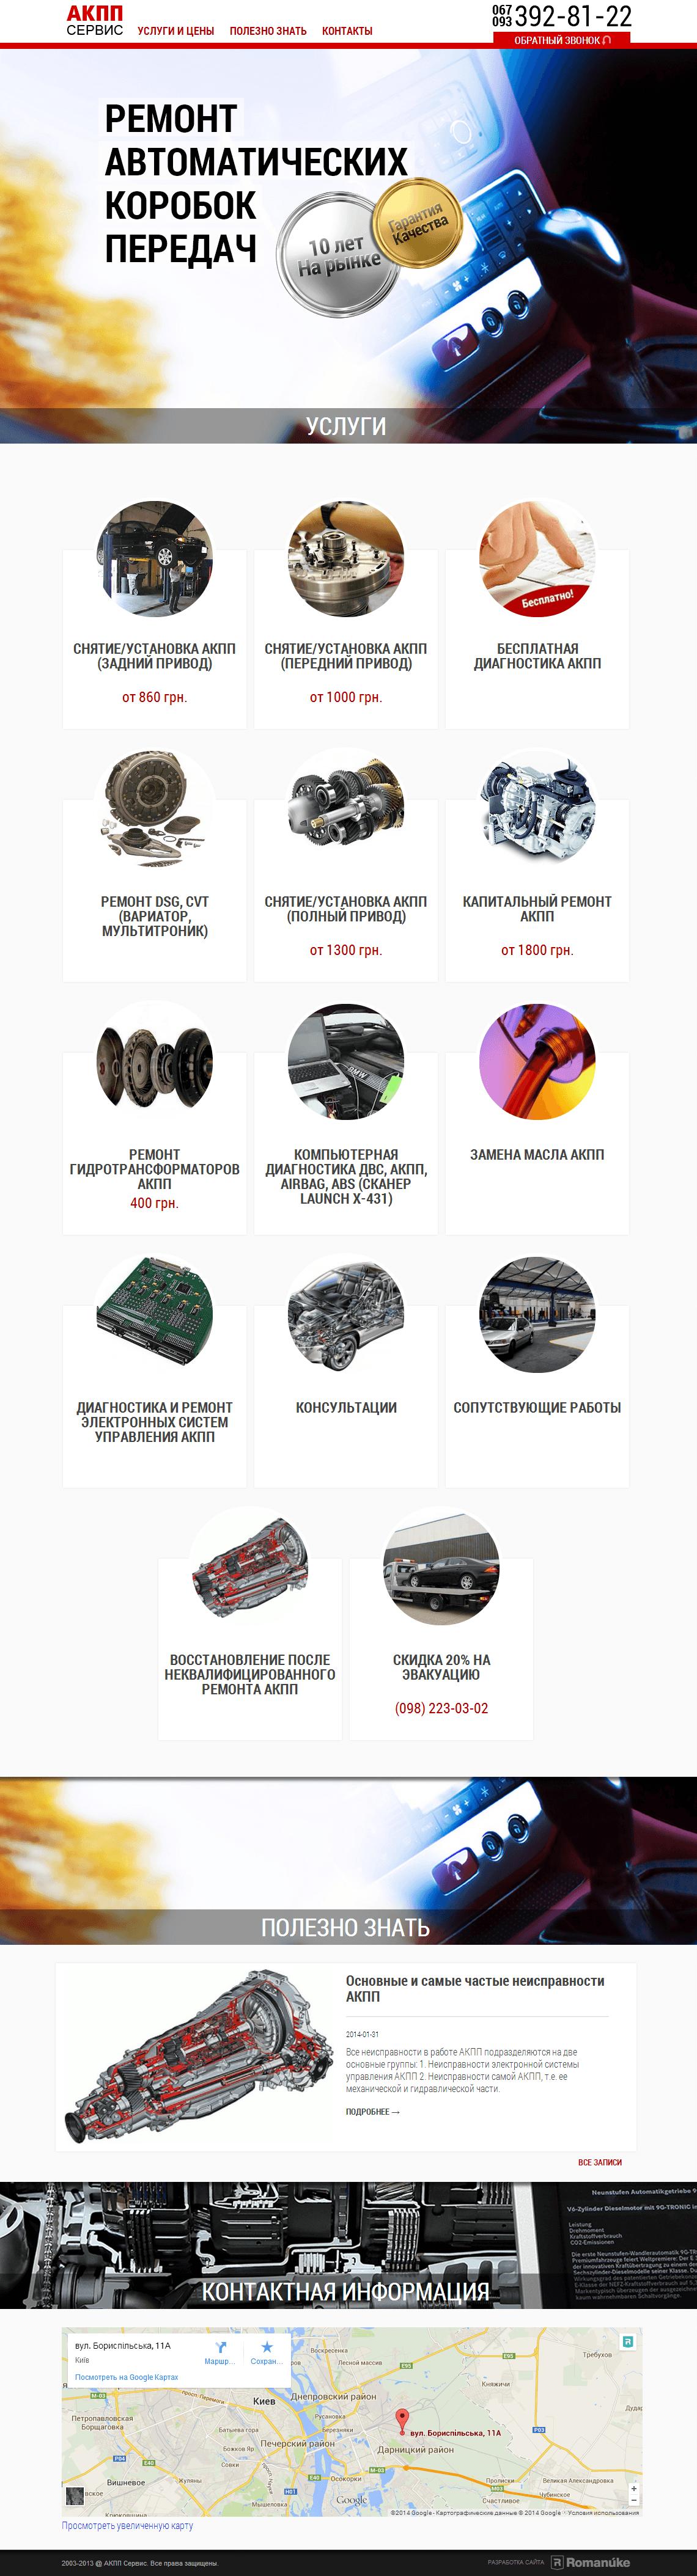 akpp-service-site